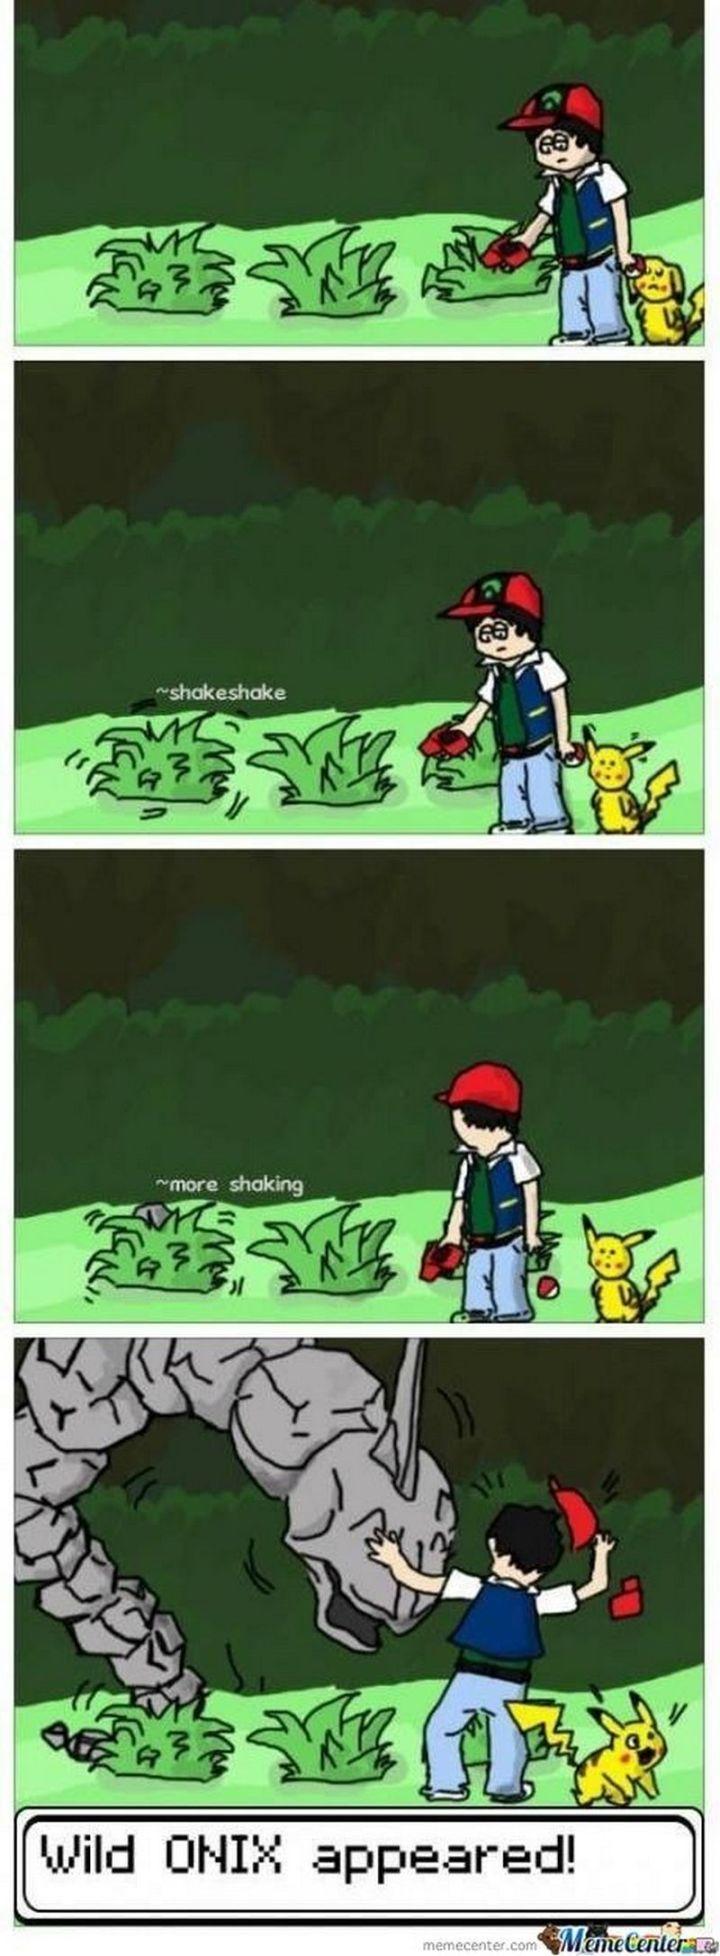 "71 Pokémon memes - ""*shake* *shake* *more shaking* Wild ONIX appeared!"""